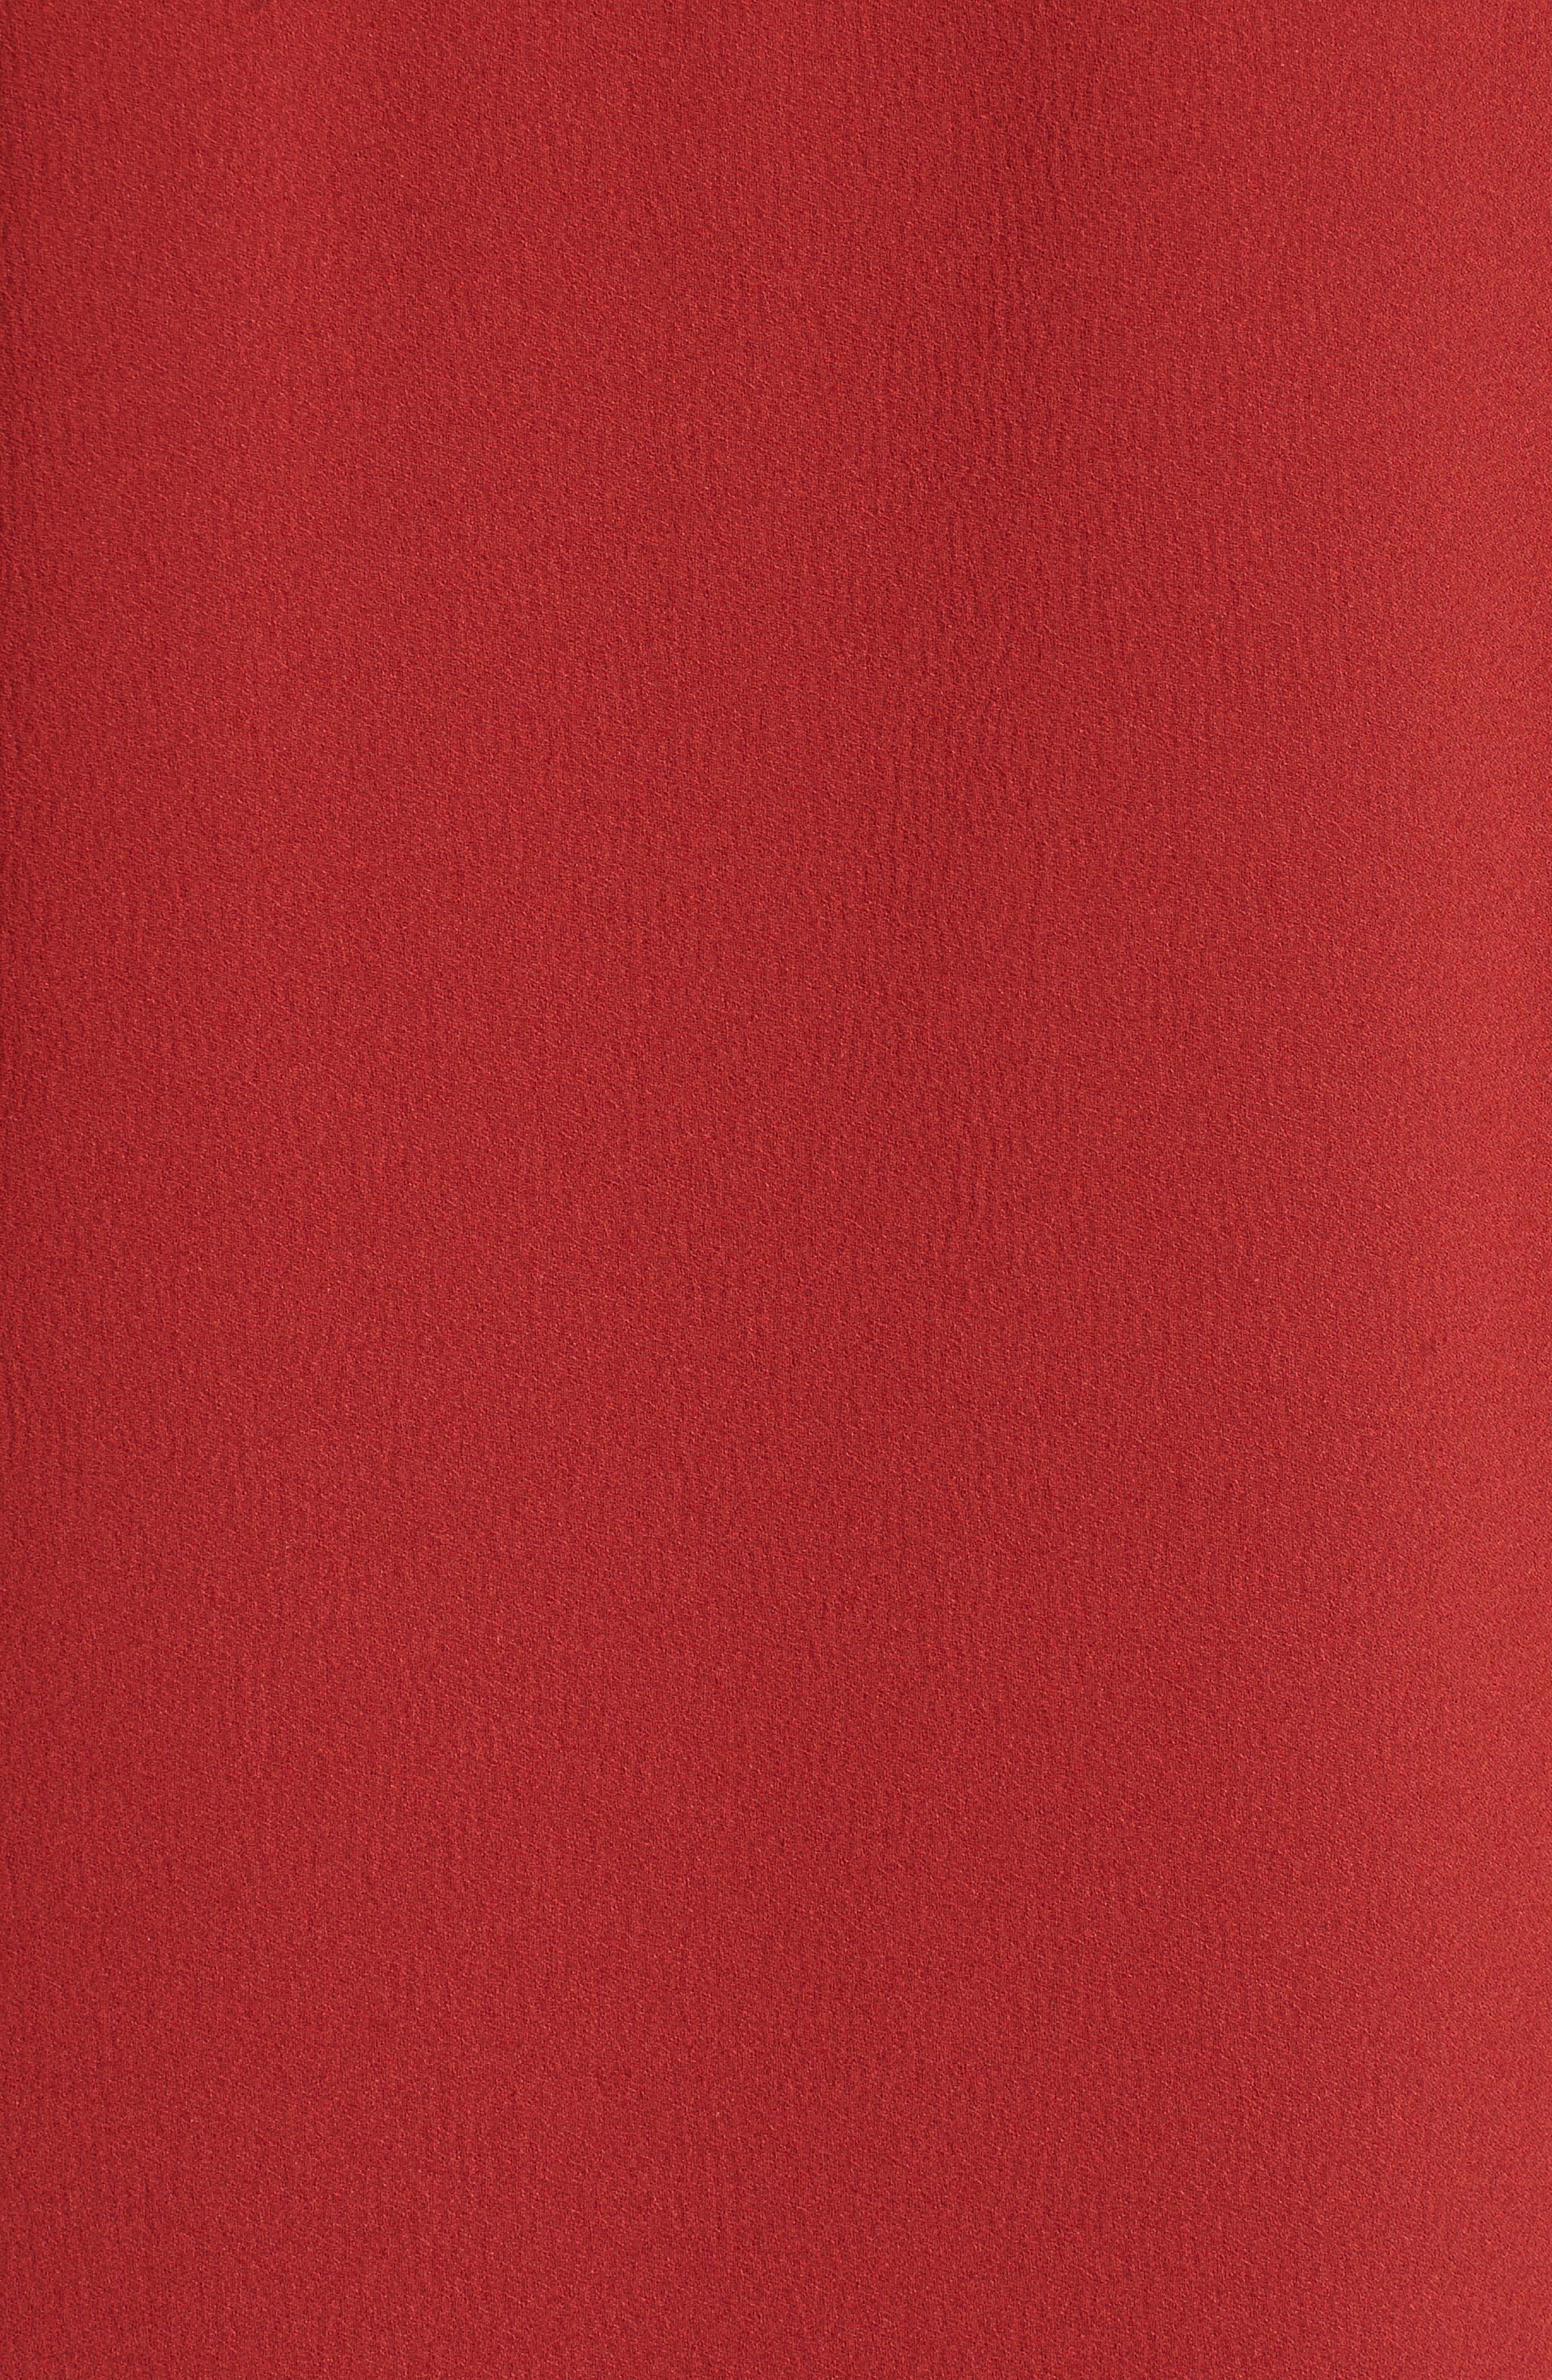 Crepe Asymmetrical Dress,                             Alternate thumbnail 5, color,